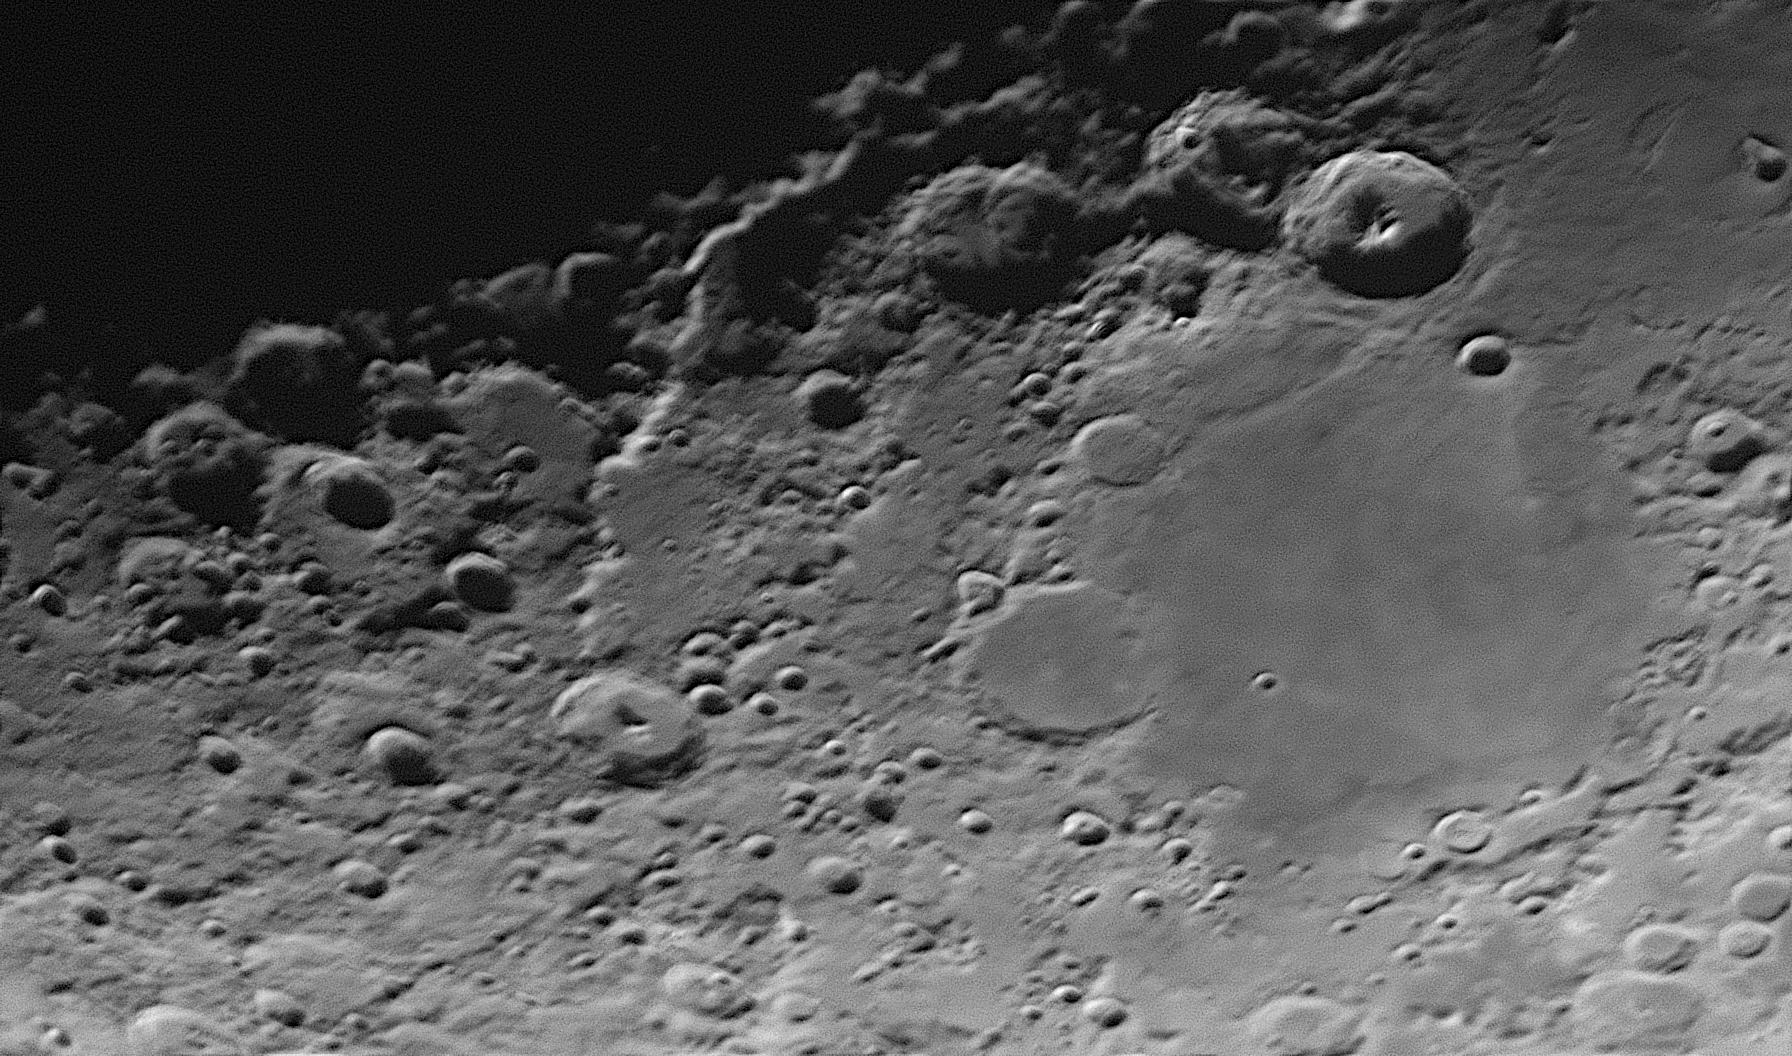 2021-02-17-2016_0-IR-Moon_lapl5_ap510_AS.png.38faa80c98959c879a79d2250cf17b20.png